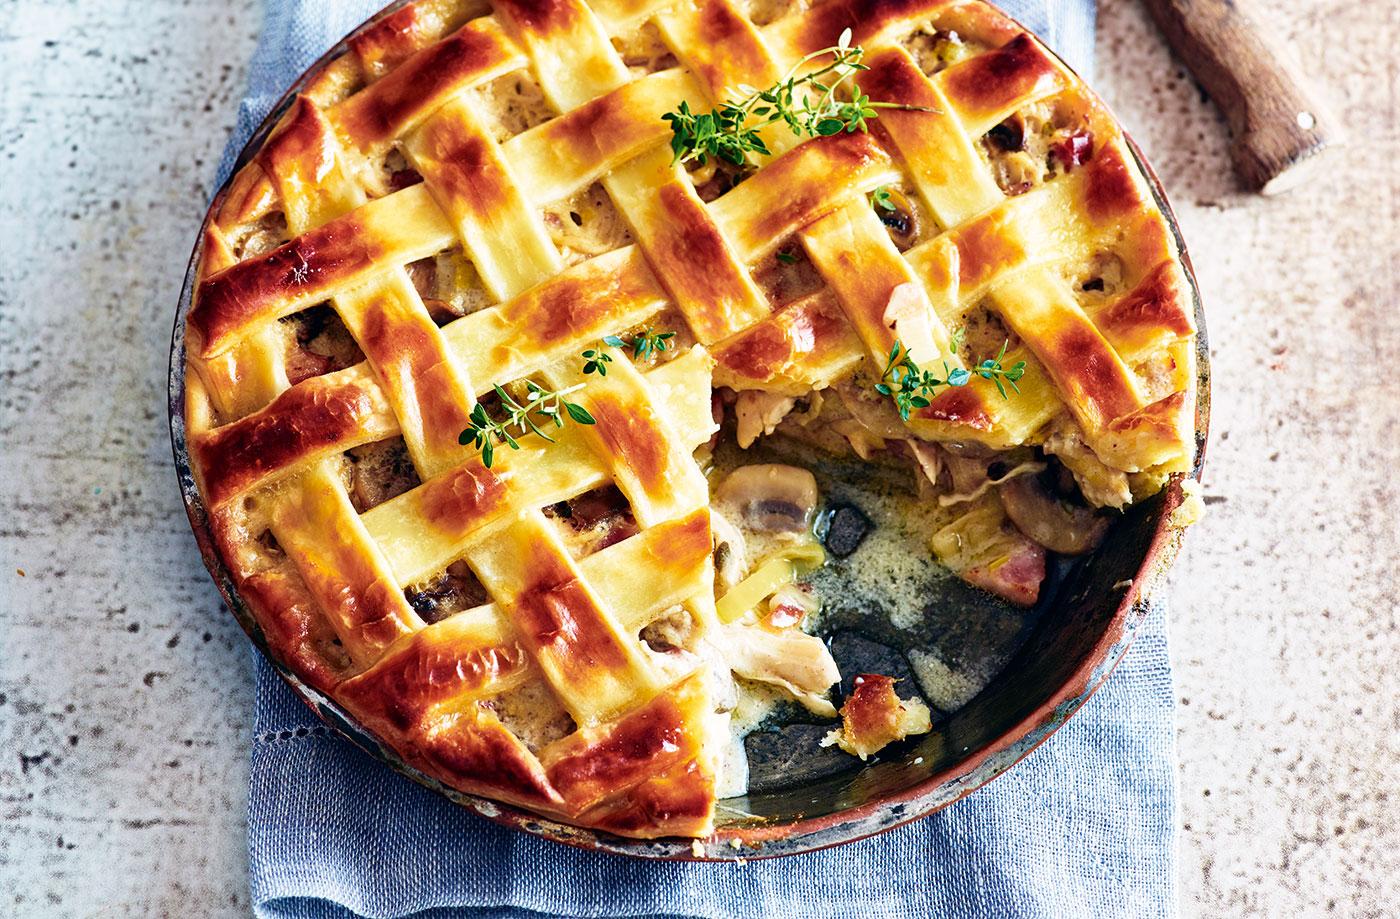 Фото: realfood.tesco.com